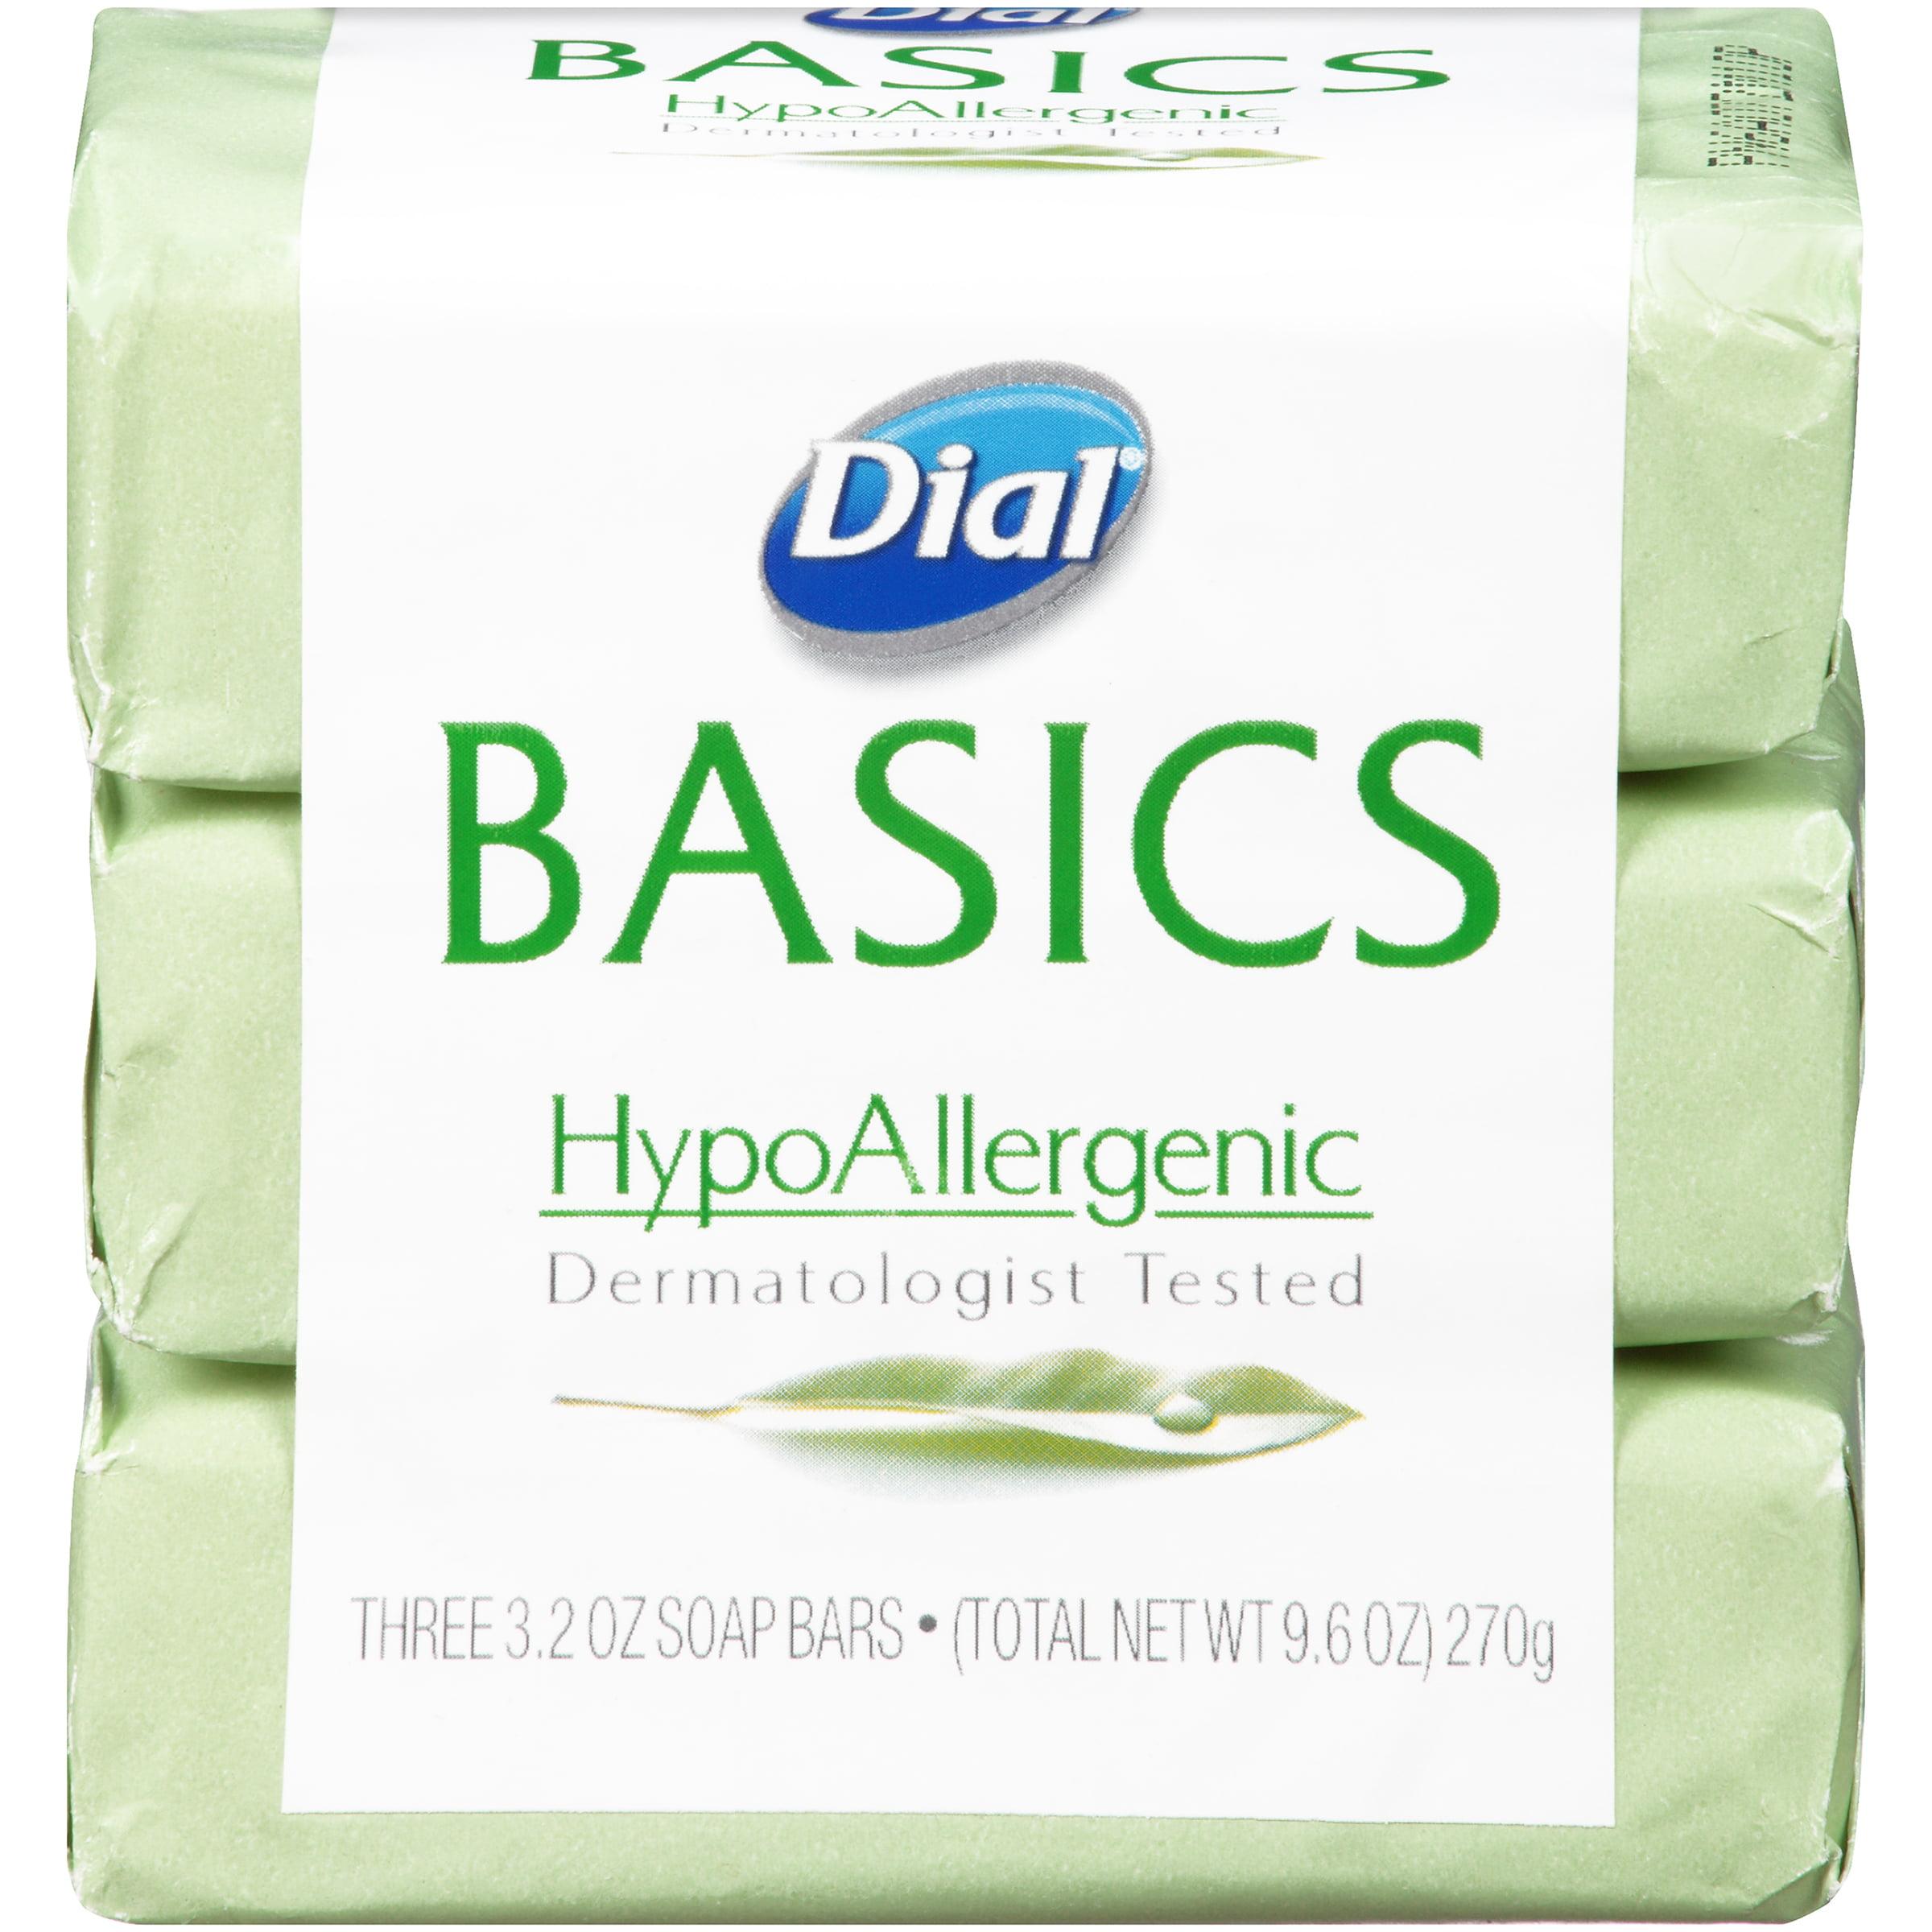 Dial Basics HypoAllergenic Bar Soap, 3.2 Ounce Bars, 3 Count